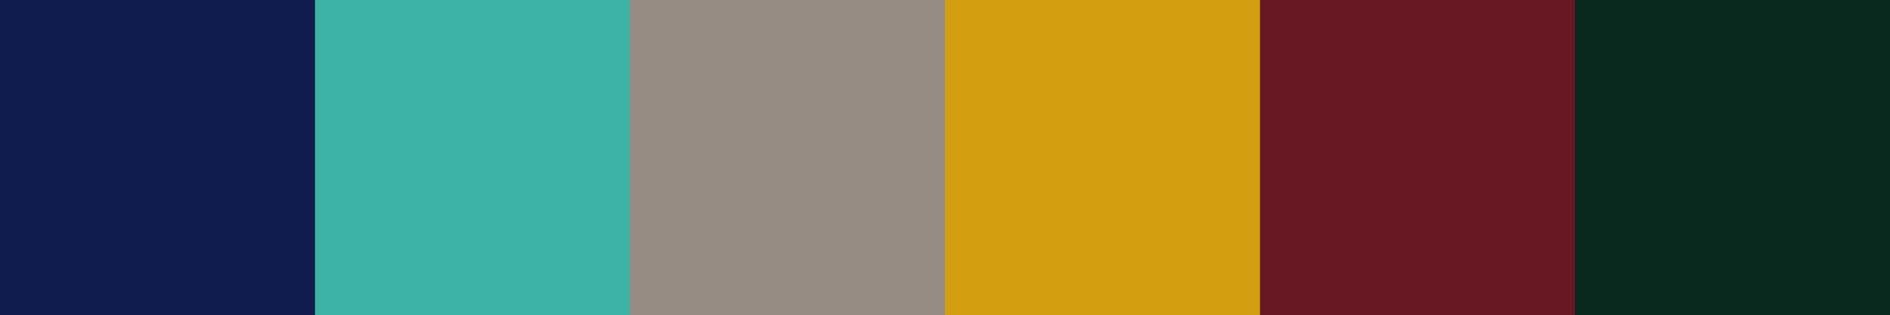 color-palette-the-mind-is-a-palace